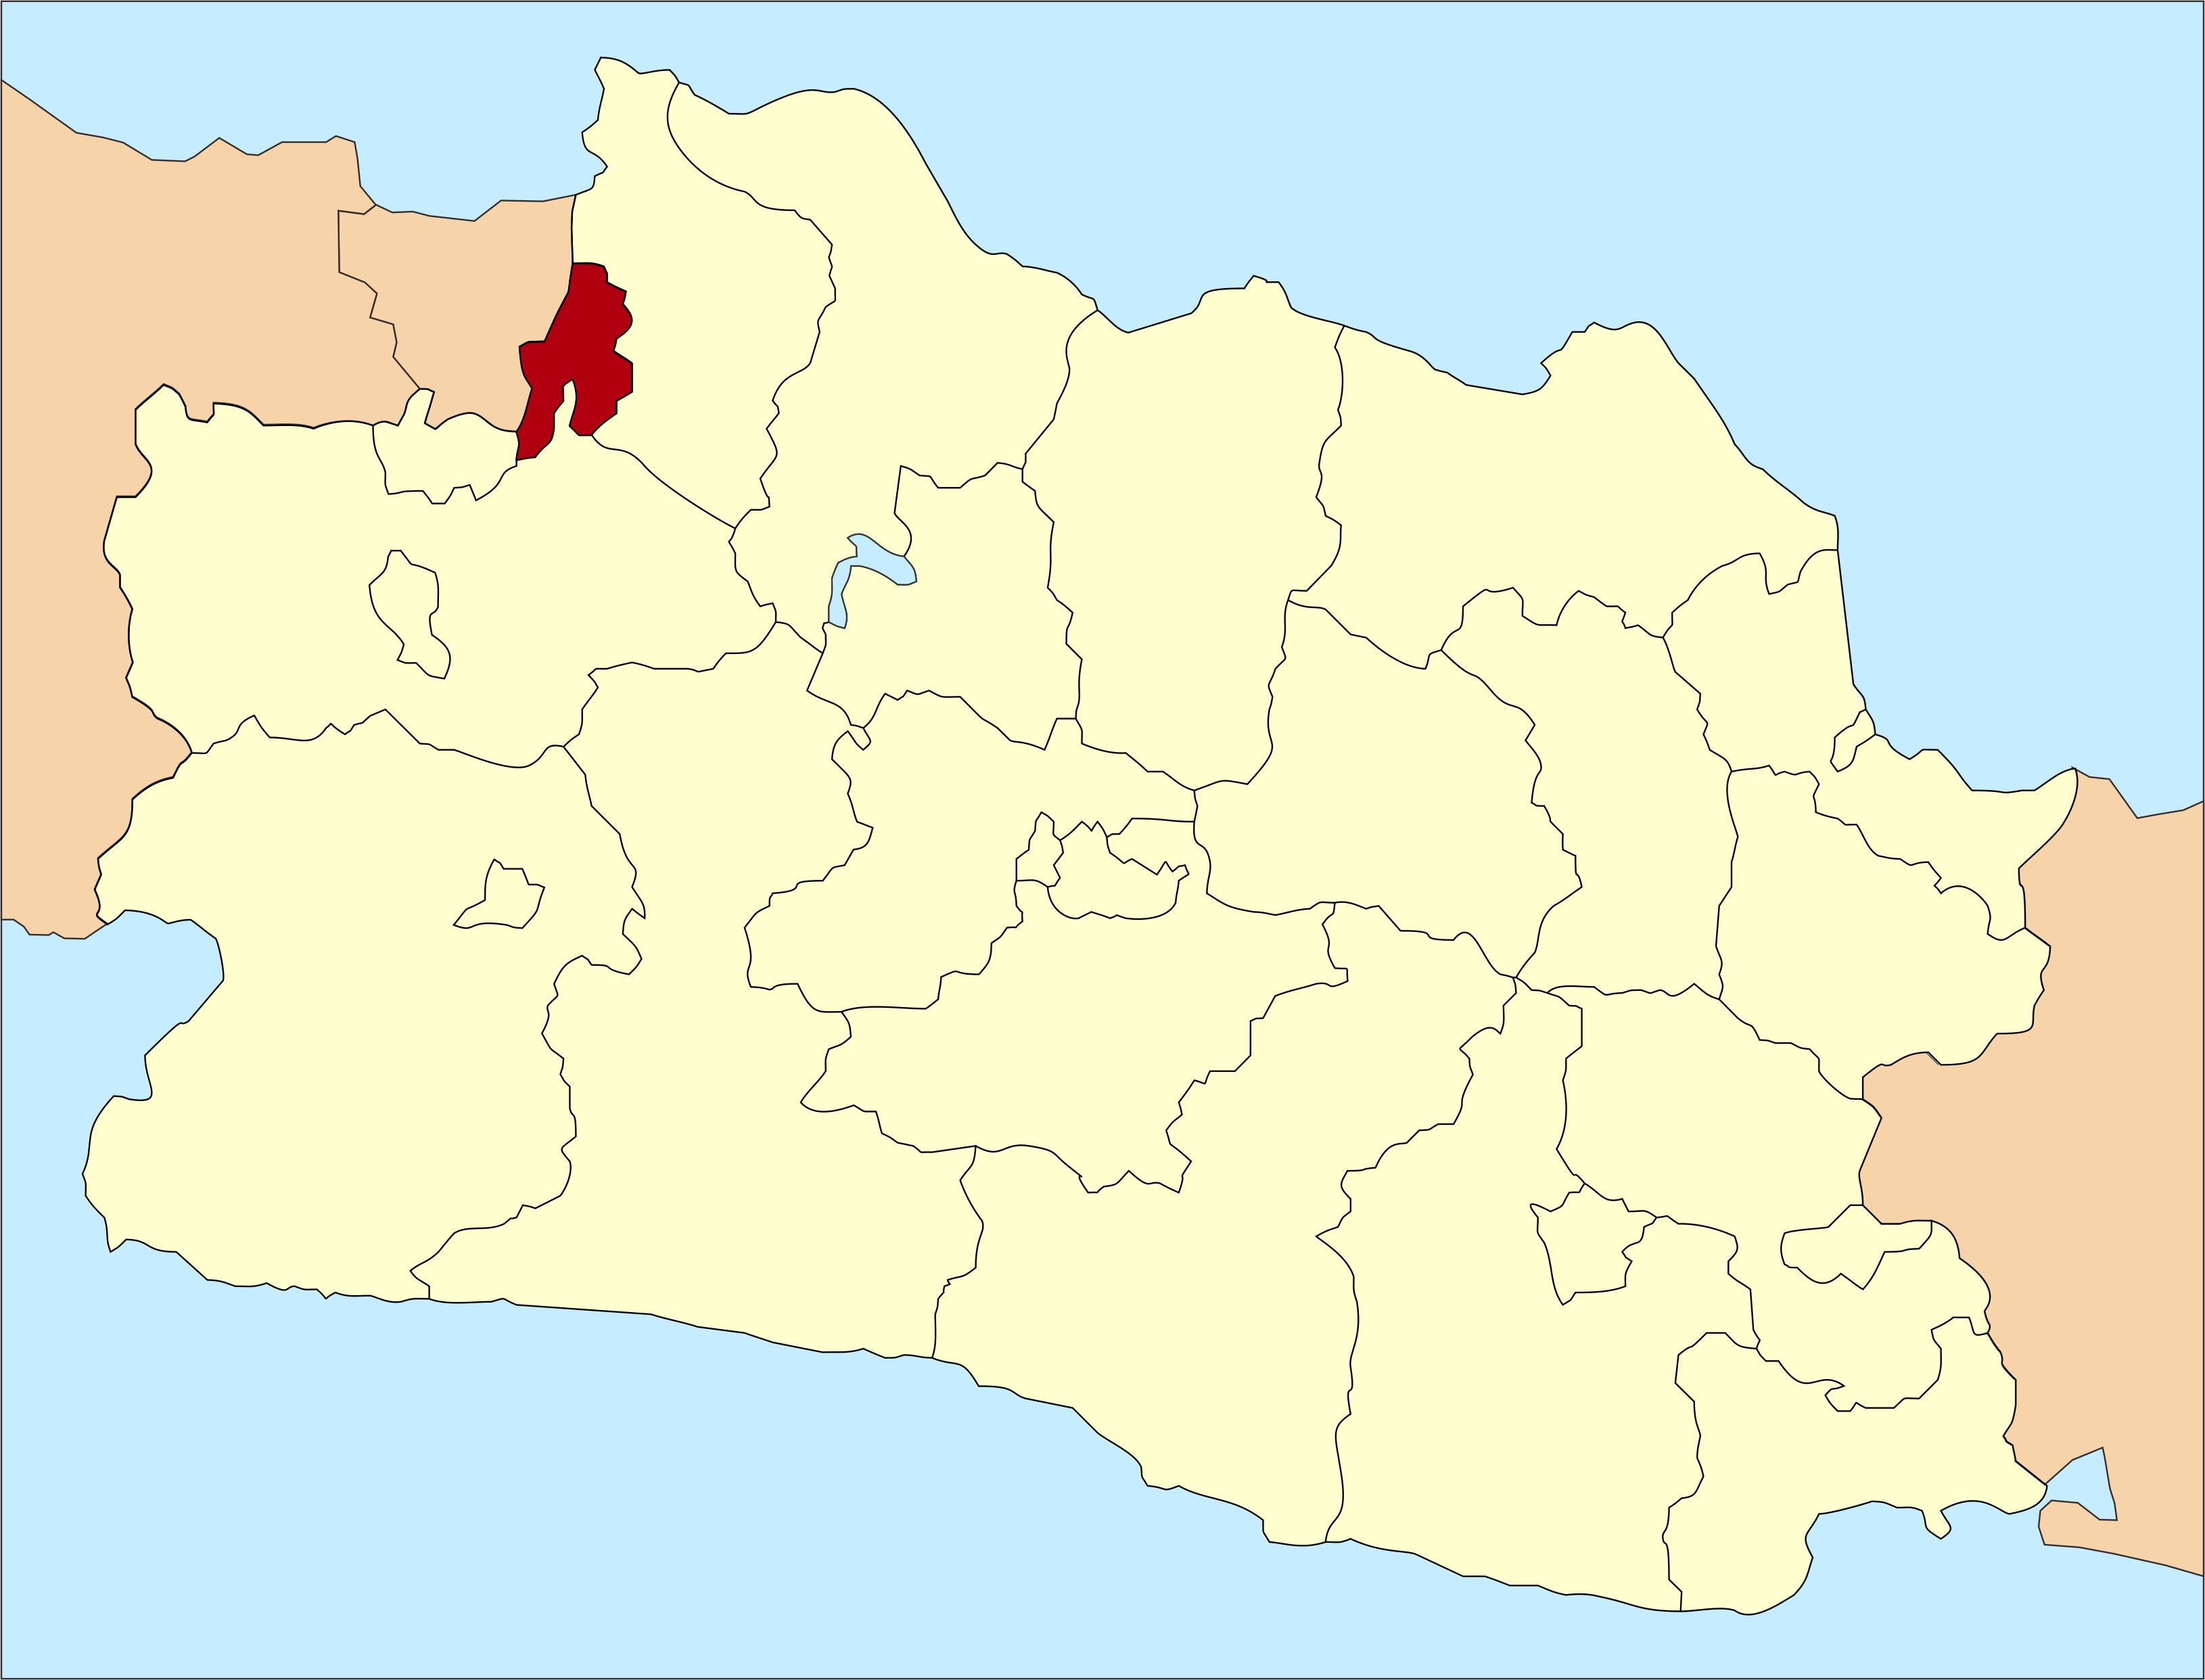 Peta lokasi Kota Bekasi